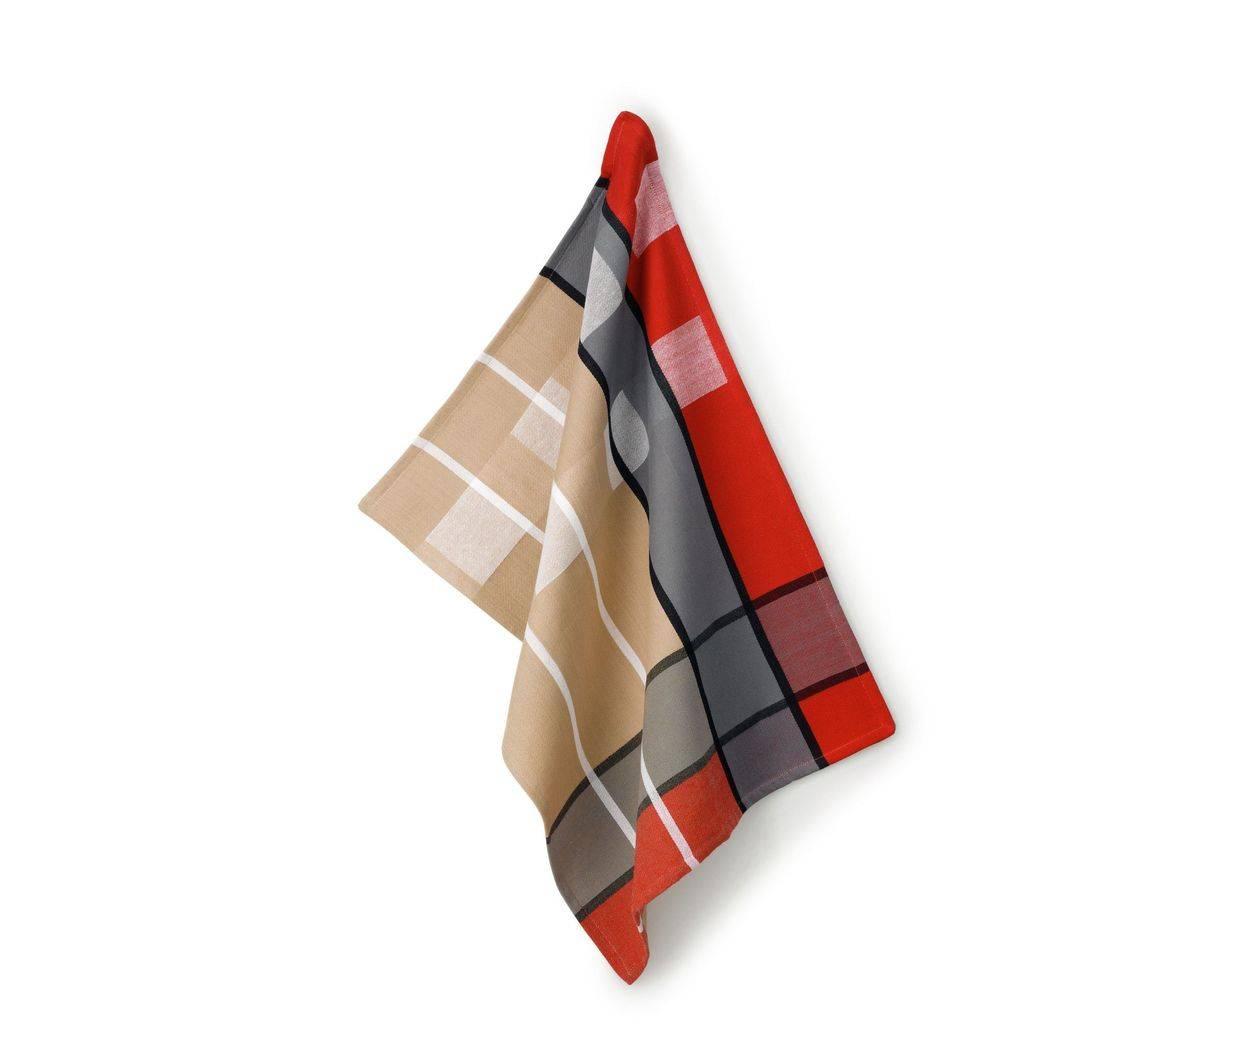 Utěrka TABEA 100% bavlna, dekor kostka, béžová / červená / šedá 50x70cm KL-11732 - Kela